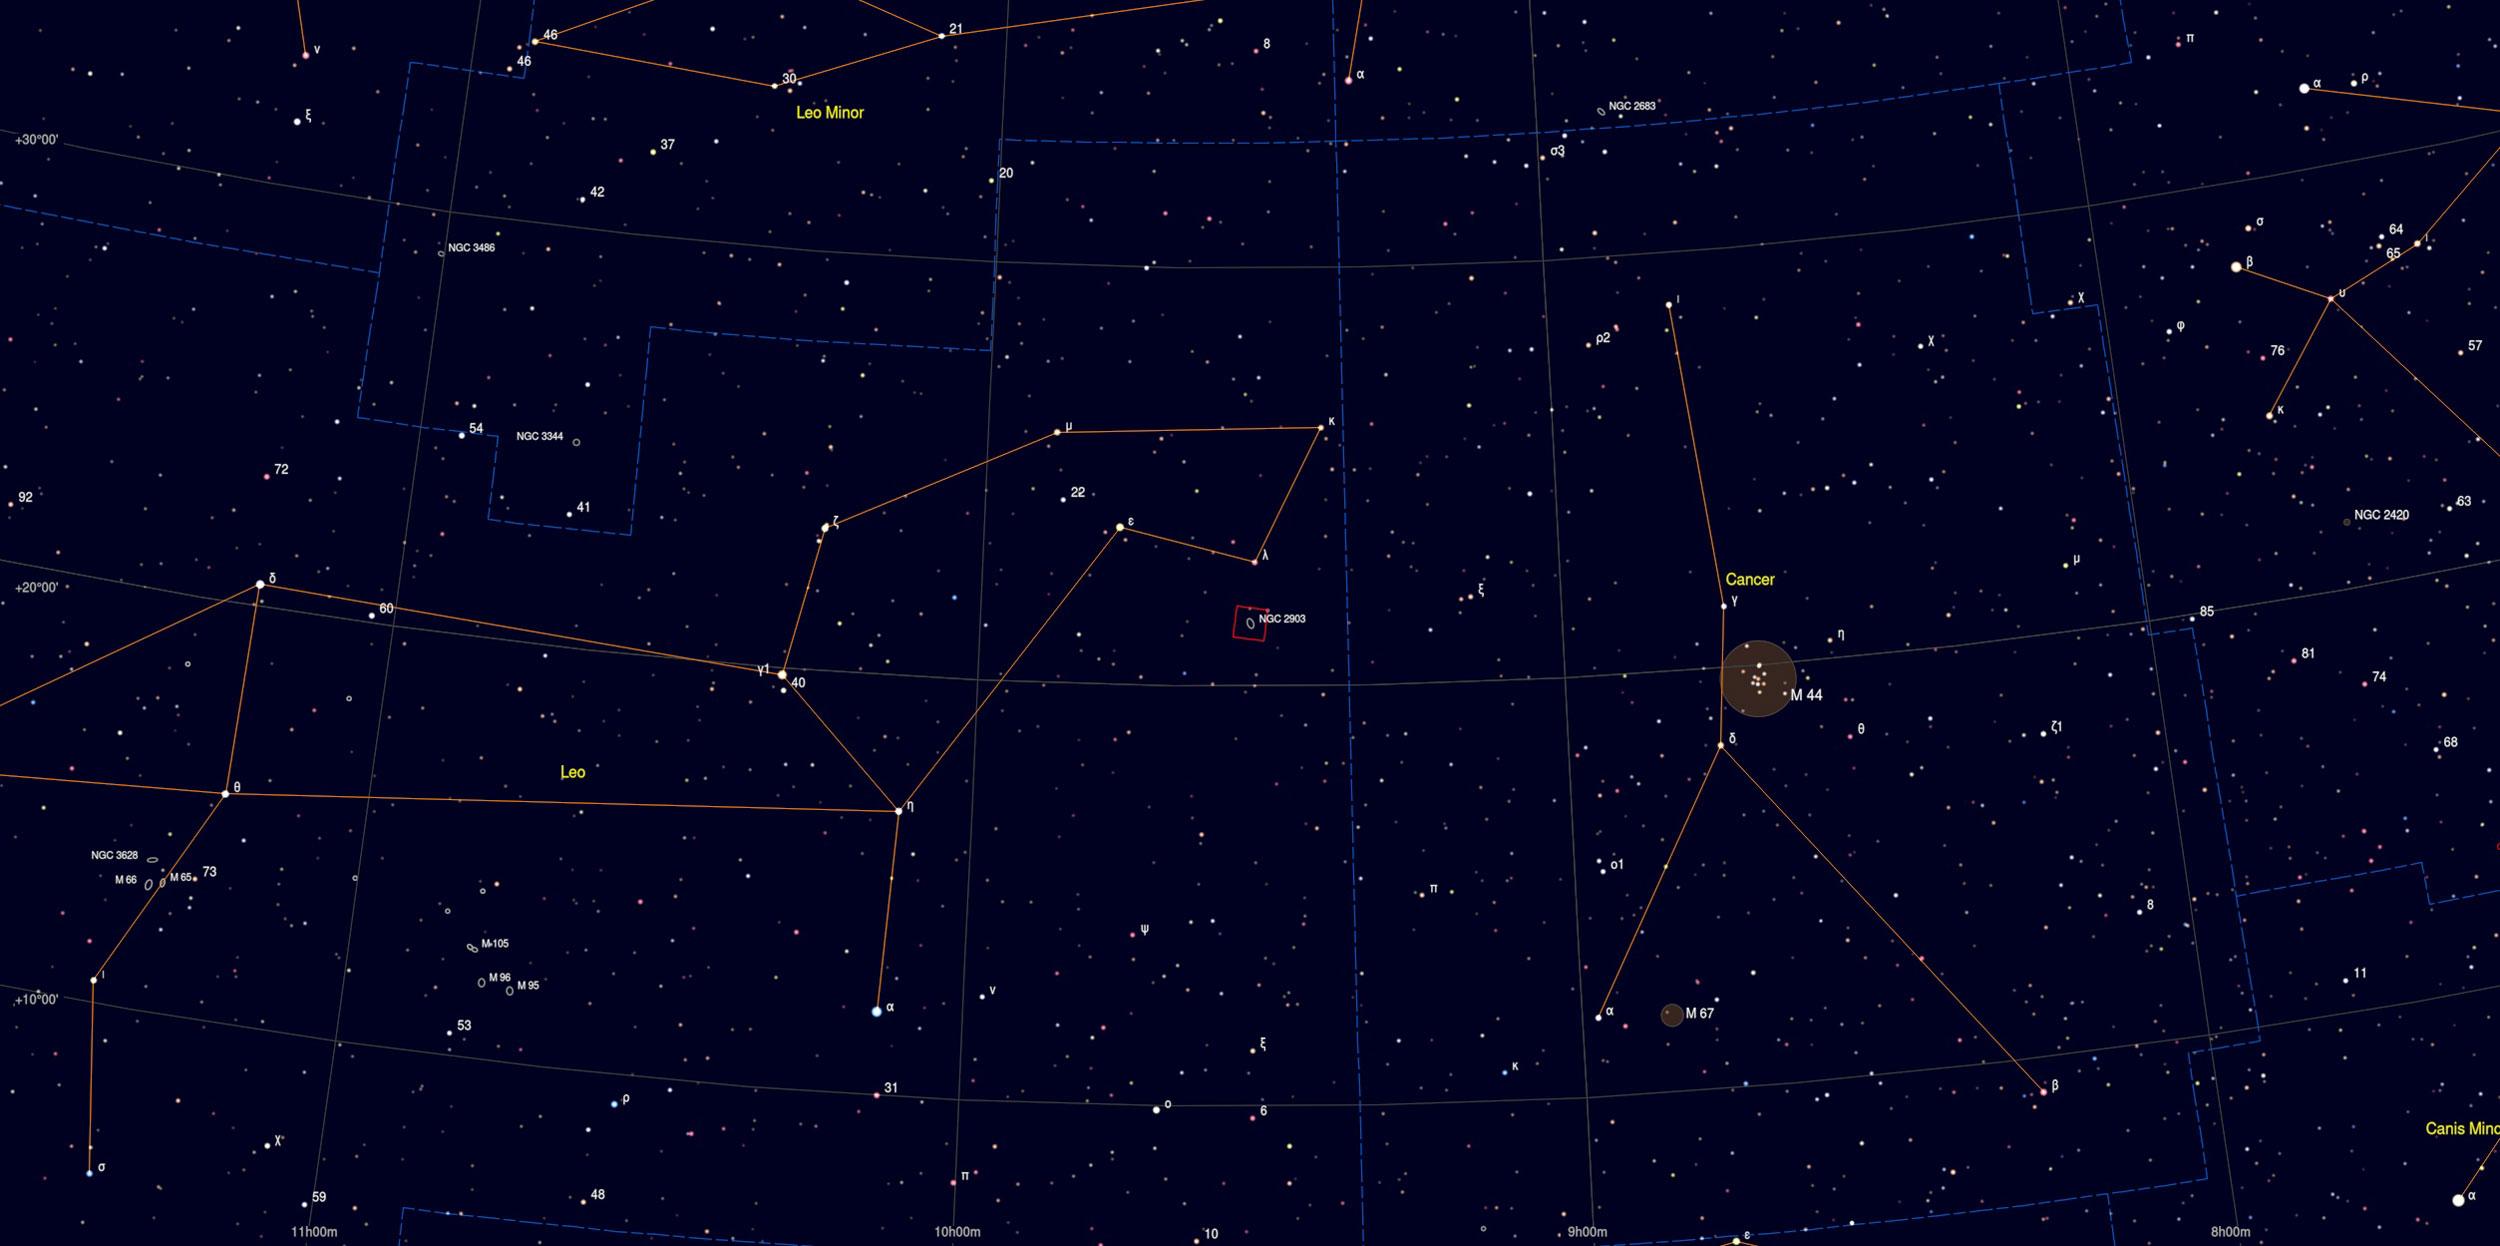 NGC 2903 Galaxy Sky Chart Astrophotography Martin Rusterholz